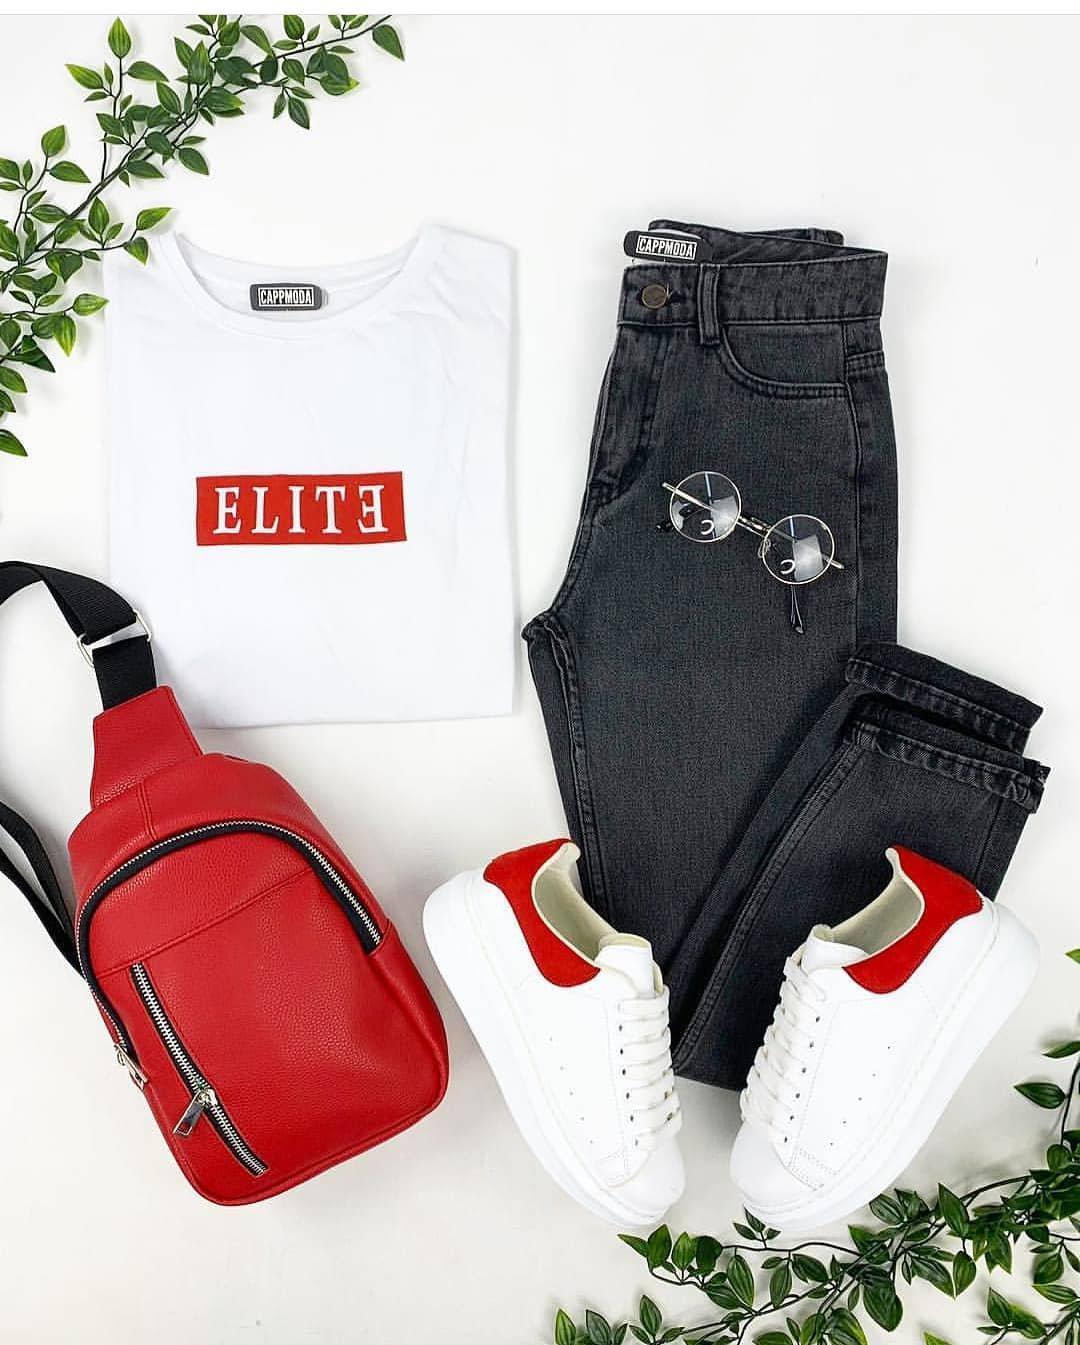 fashioninhappiness bvswkatfgn45355766102440650860